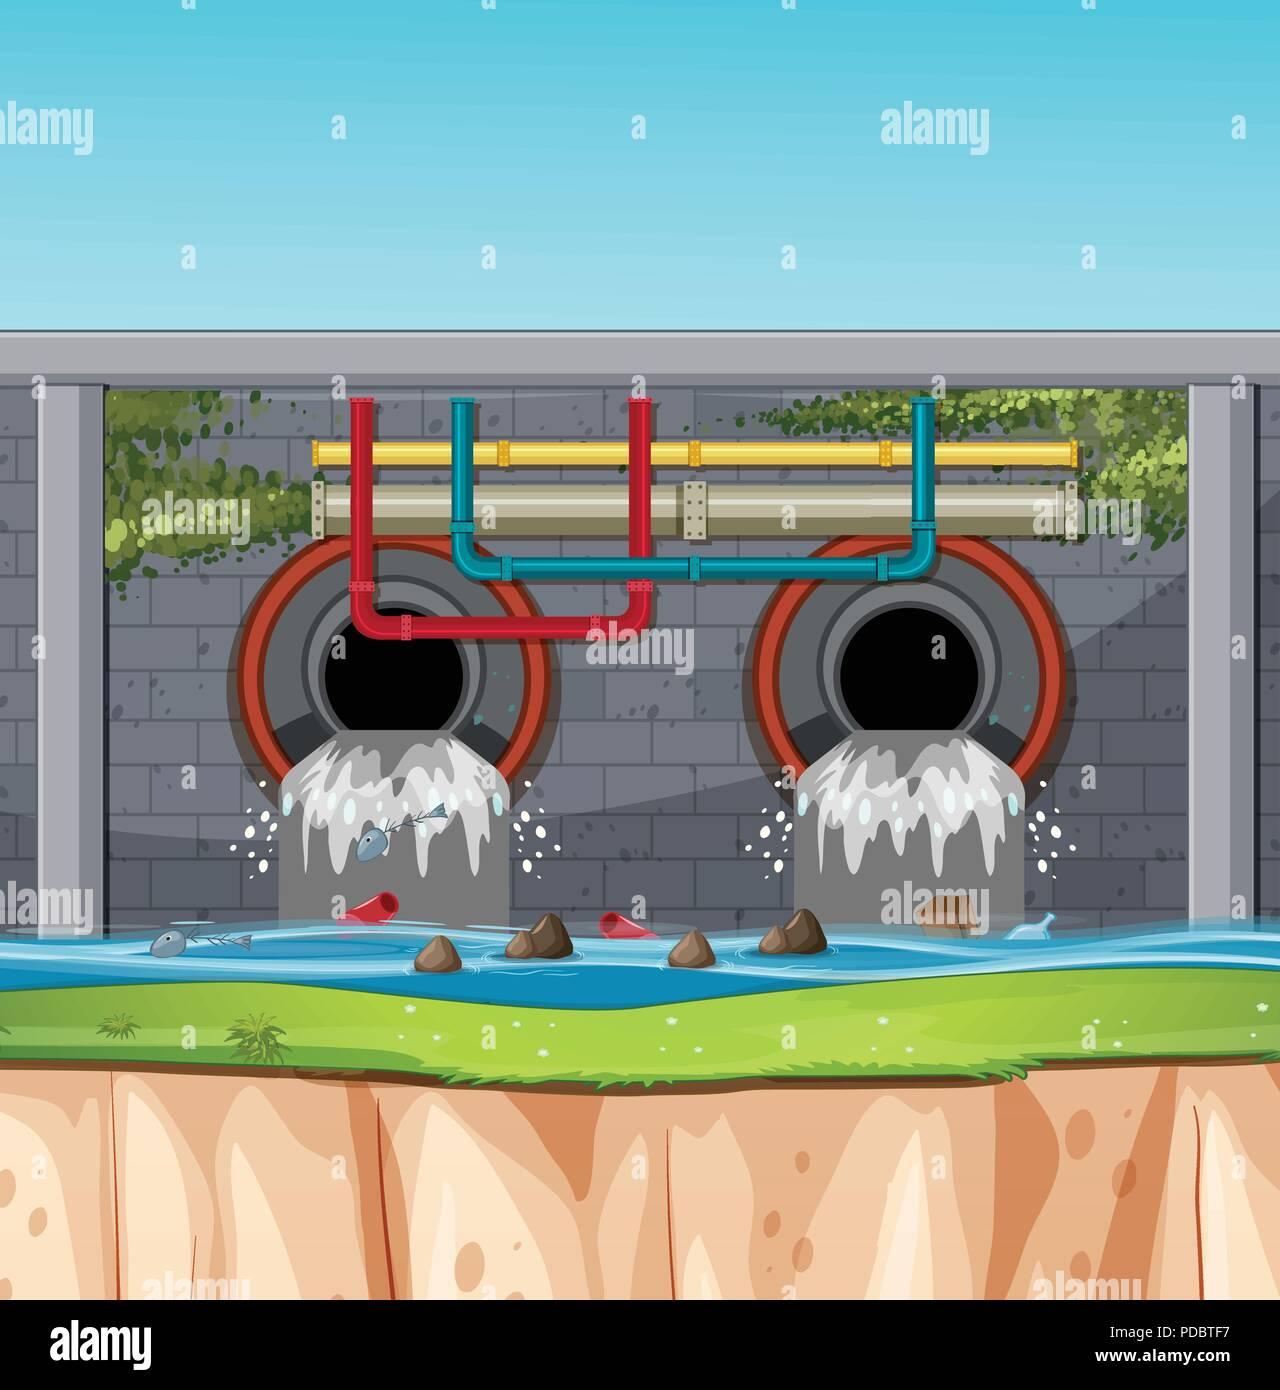 A sewage tunnel scene illustration - Stock Image